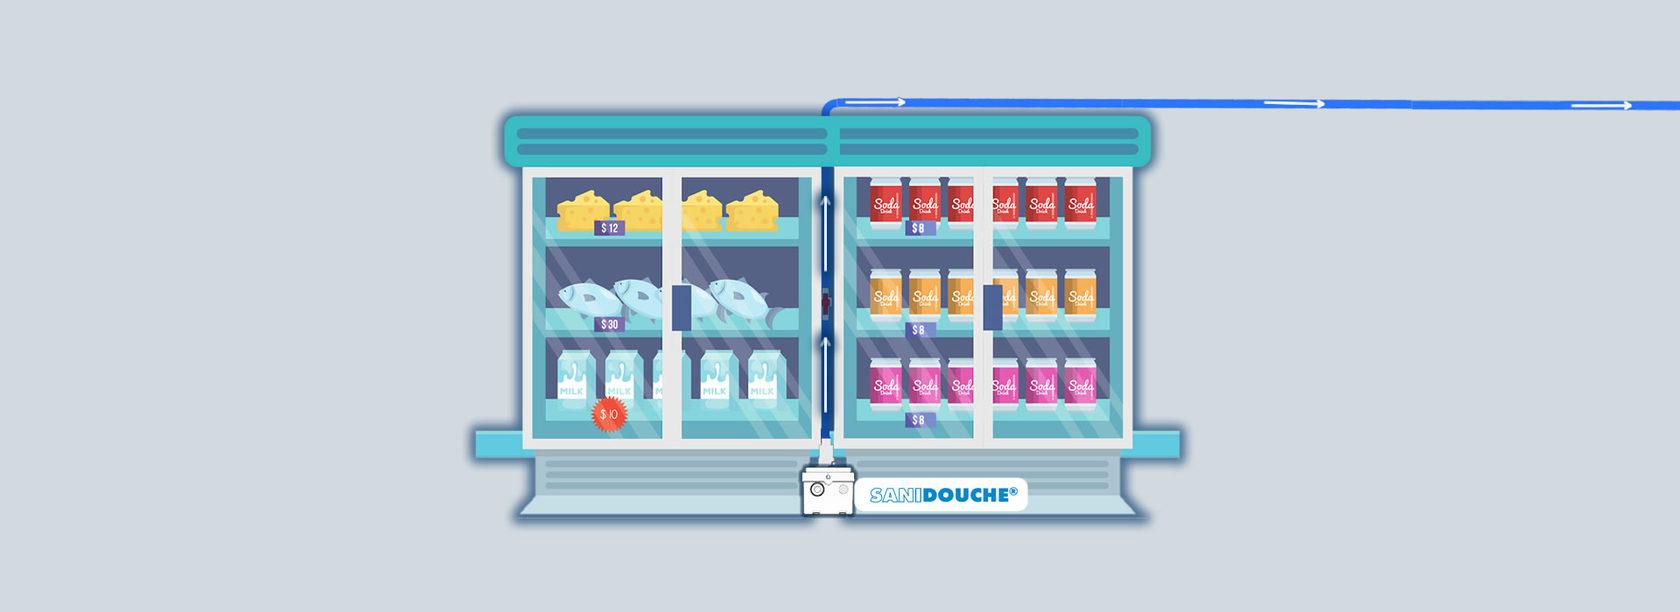 насос отвод конденсата от холодильника